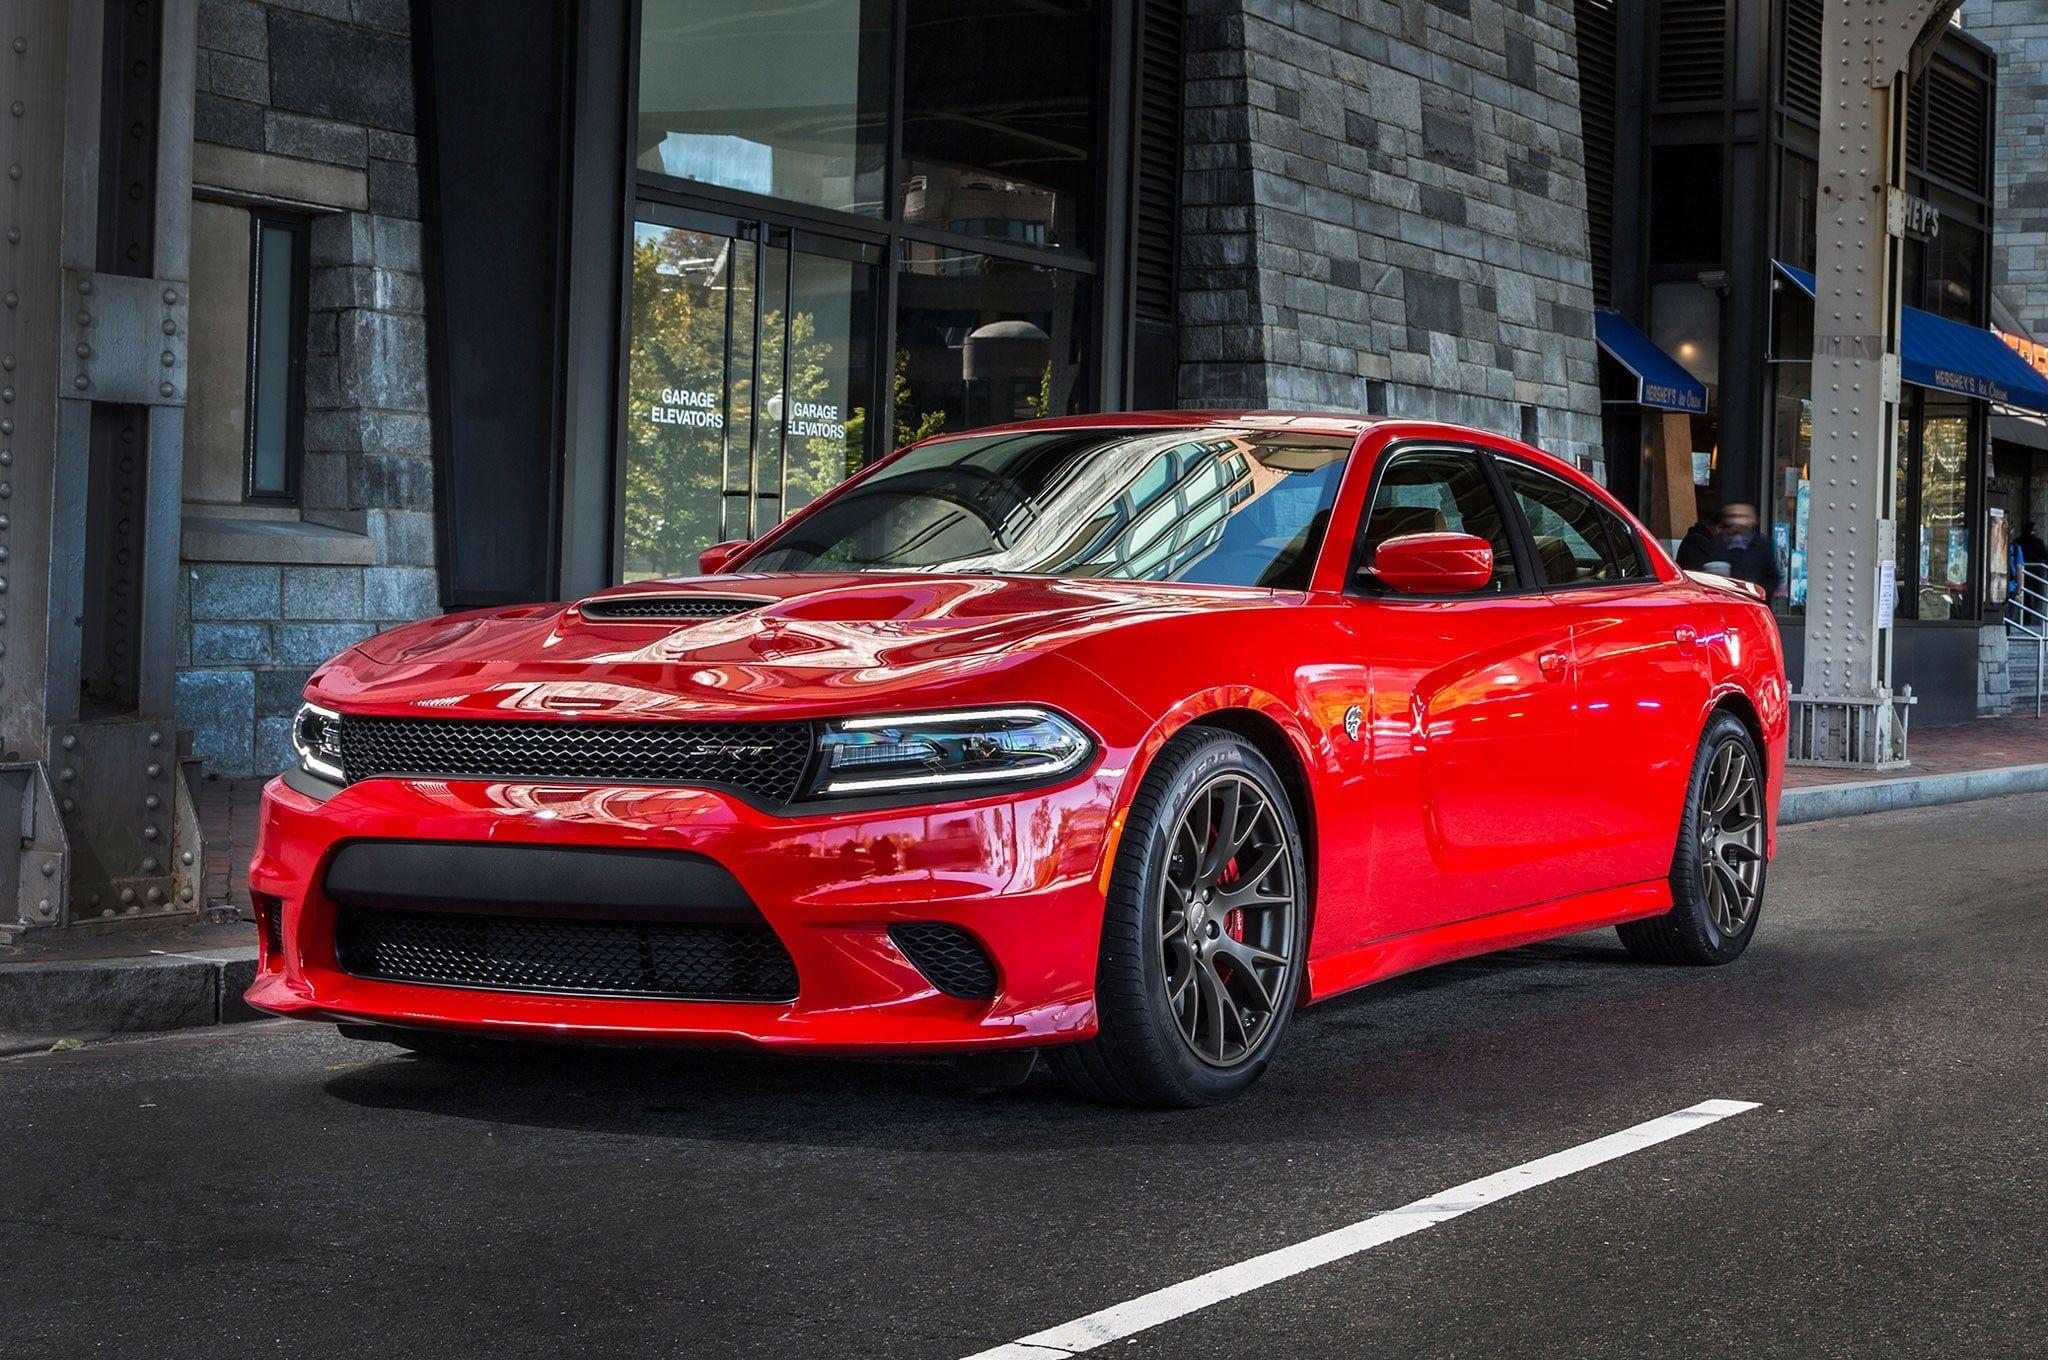 40 Best Sports Cars Under 30K (30k) in U.S. (2018 2019